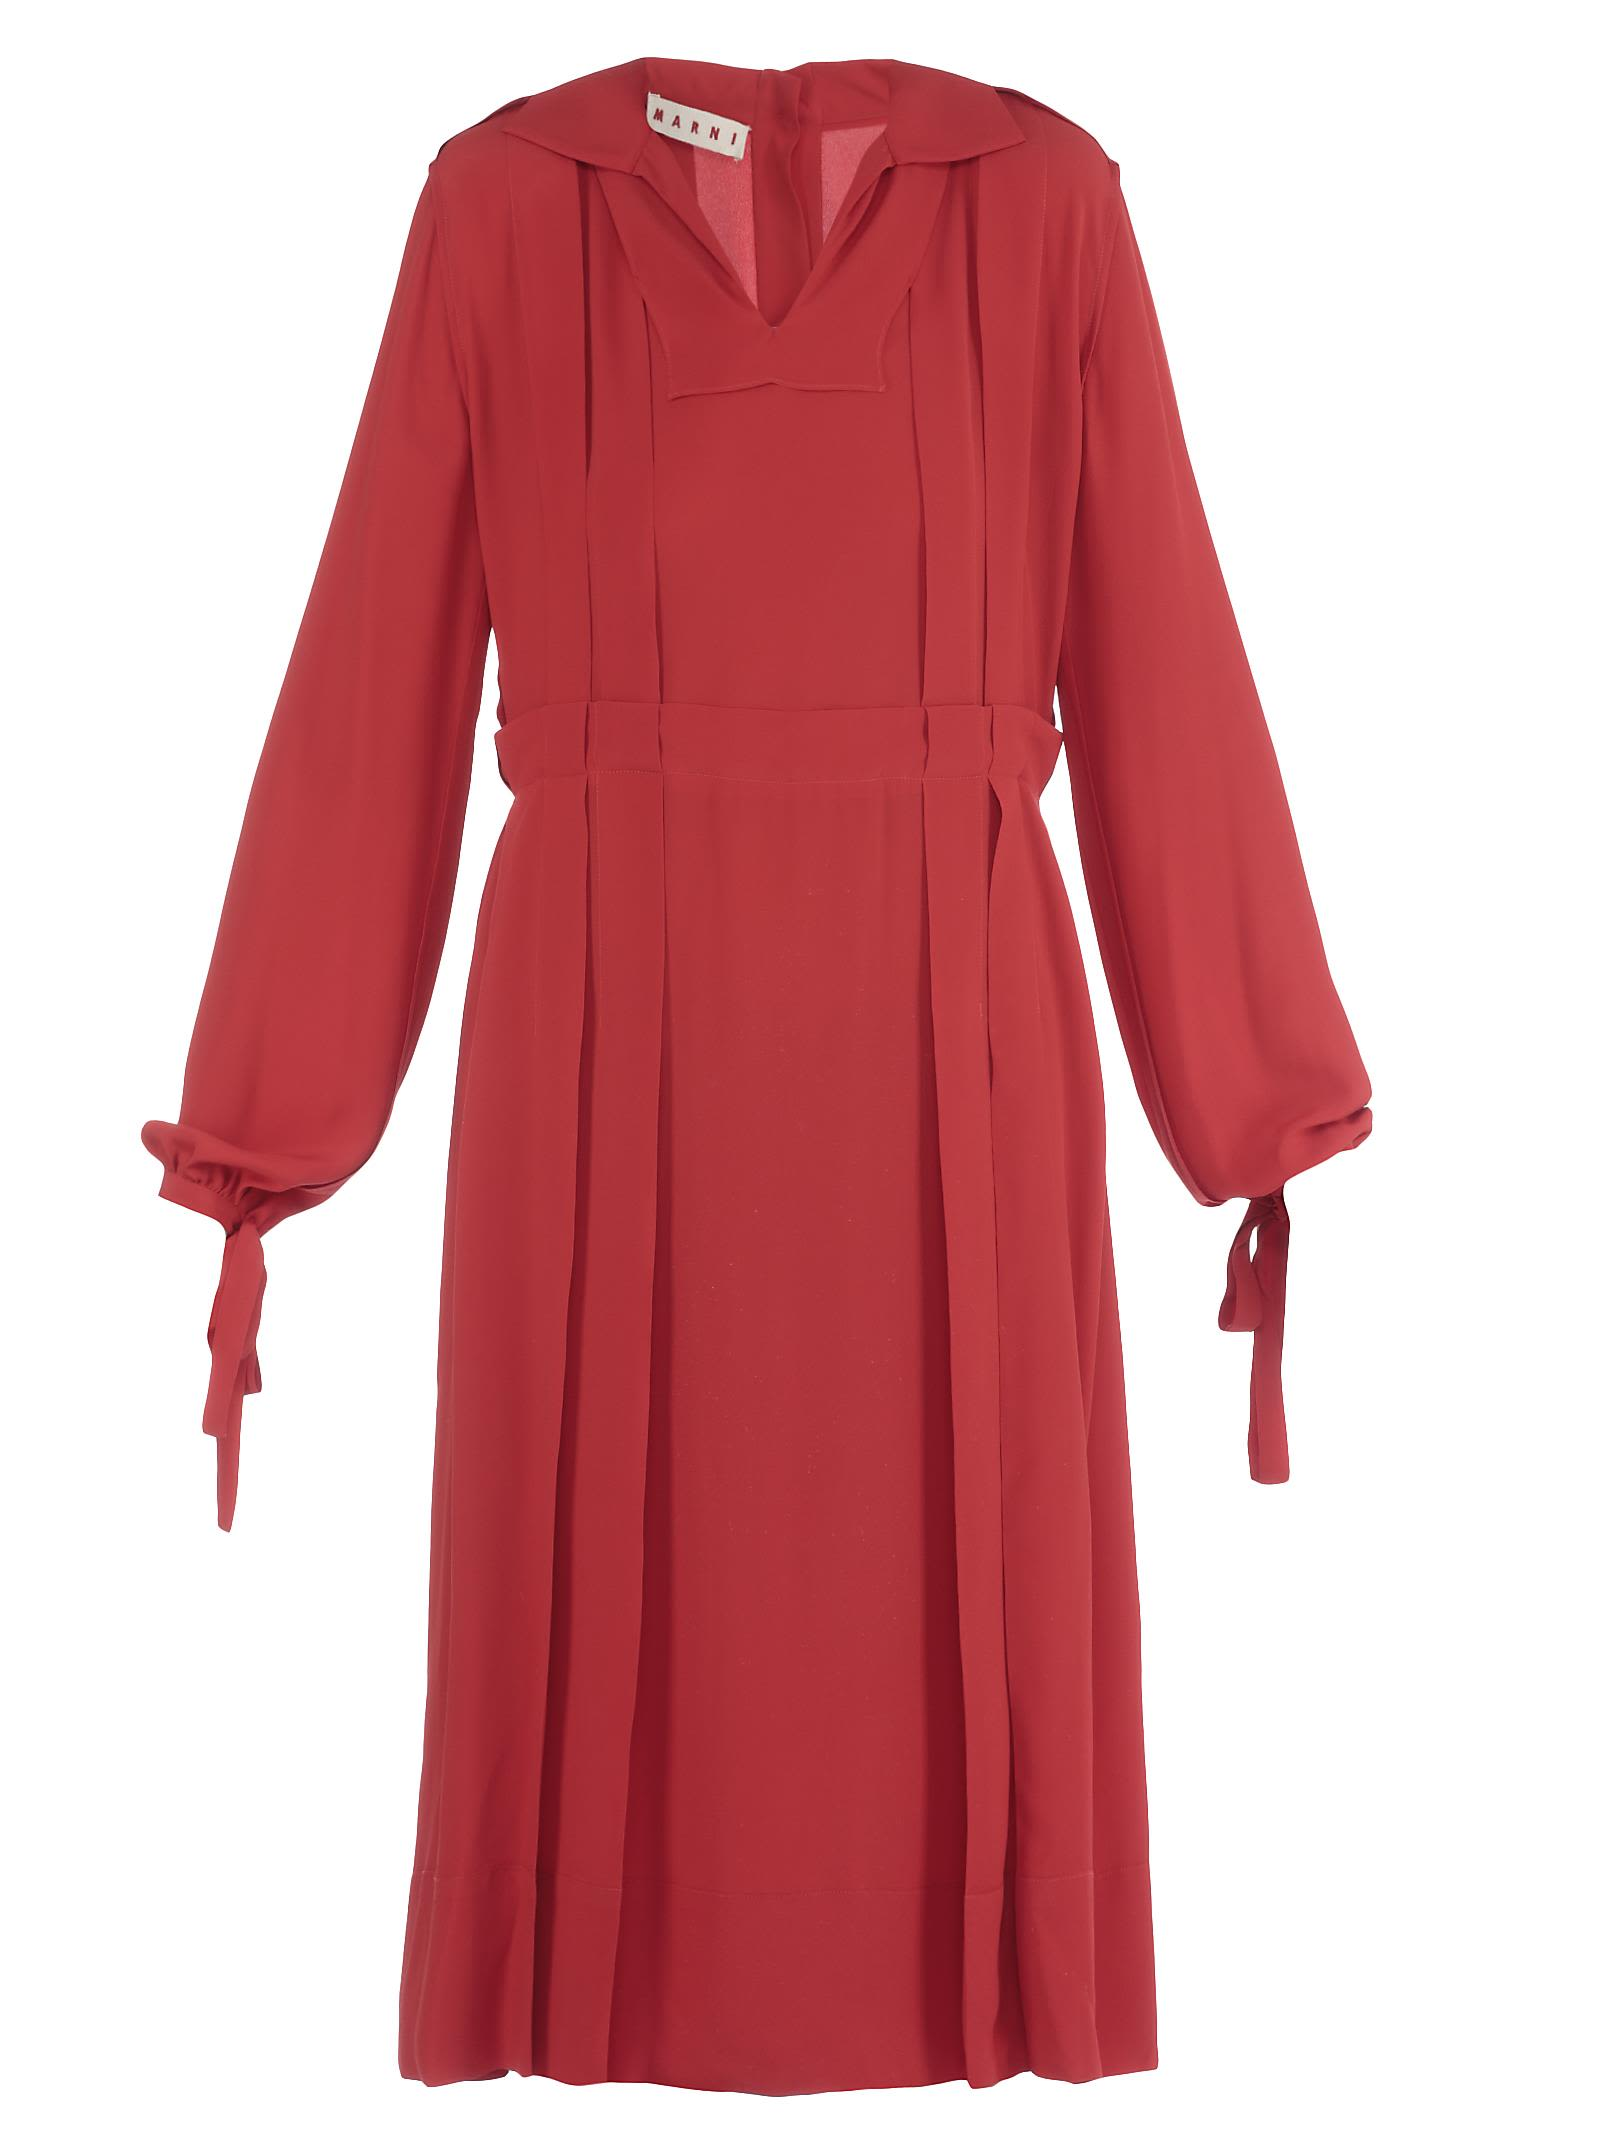 Marni Silk Blend Dress